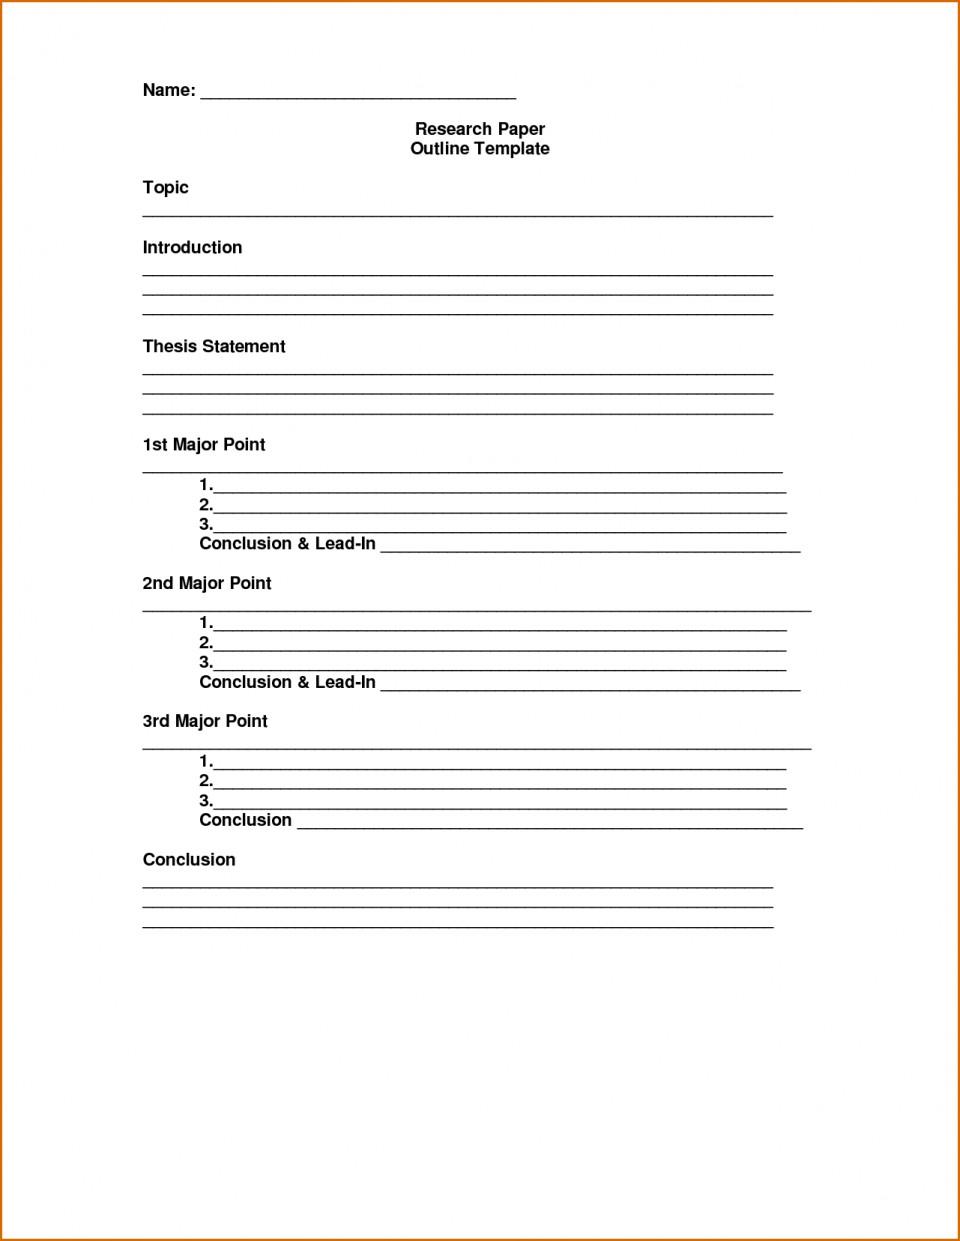 005 Essay Outline Template Excellent Mla Argumentative High School Research Paper Pdf 960